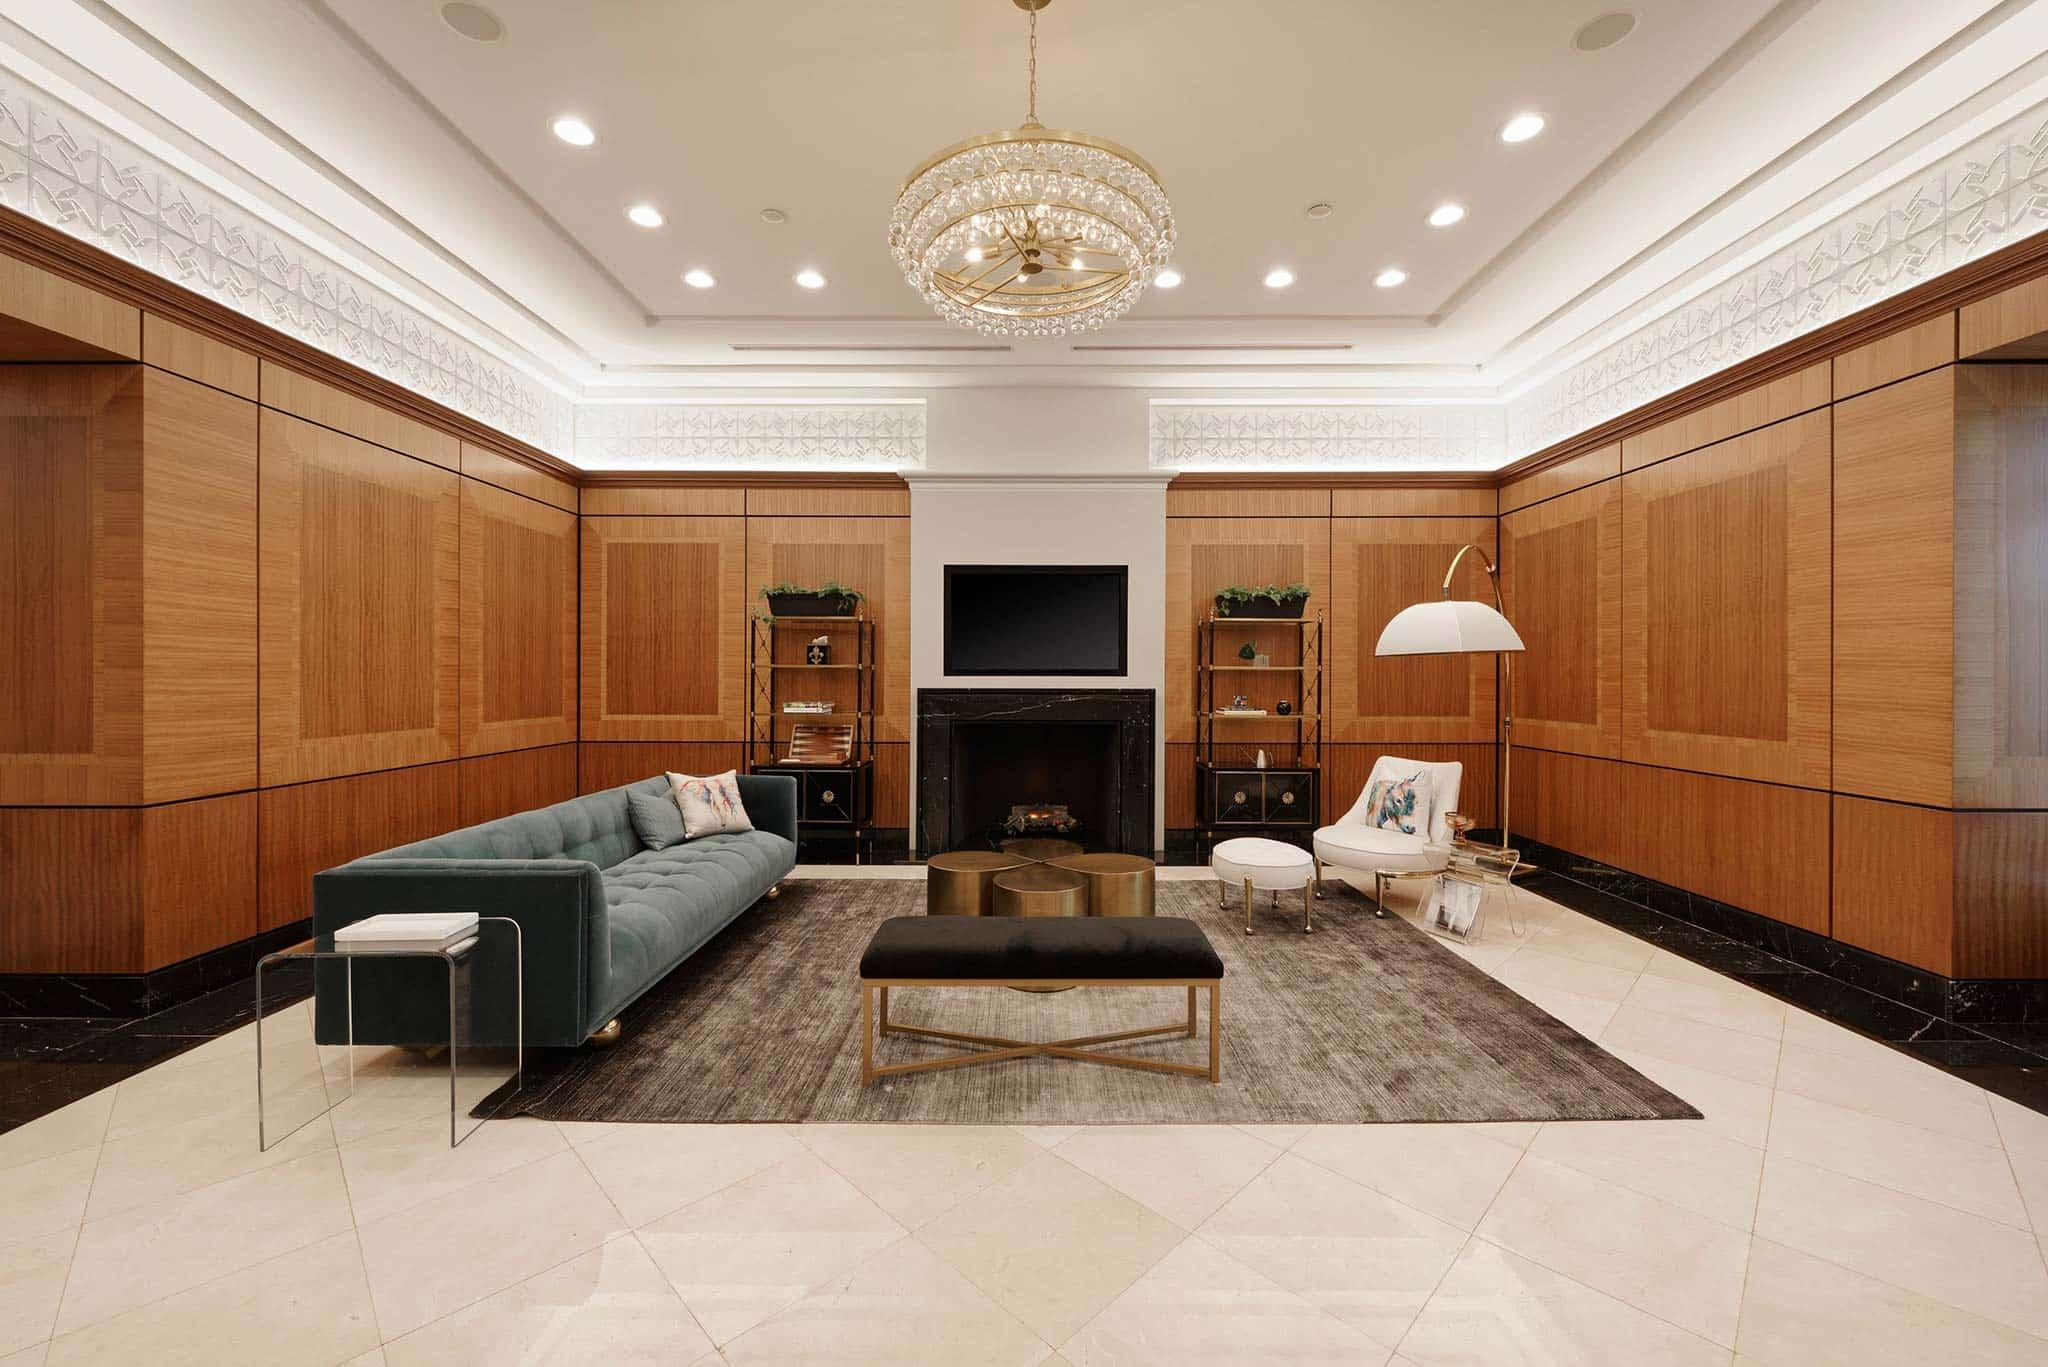 2401 Pennsylvania Avenue lobby and front desk